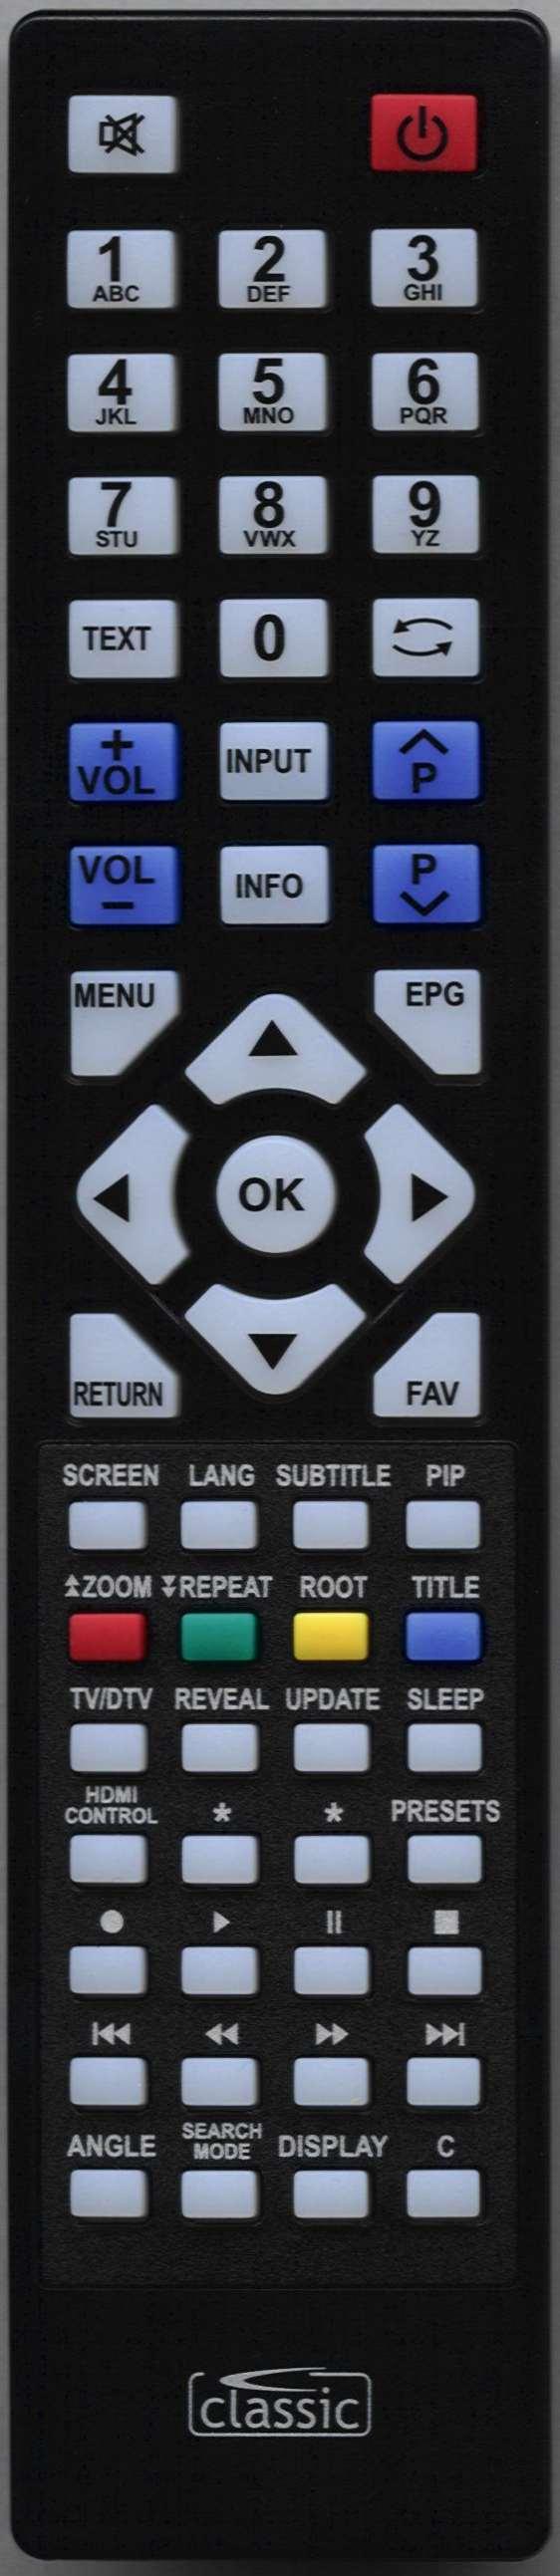 LUXOR - LUX32875TVBFHD Alternative Remote Control